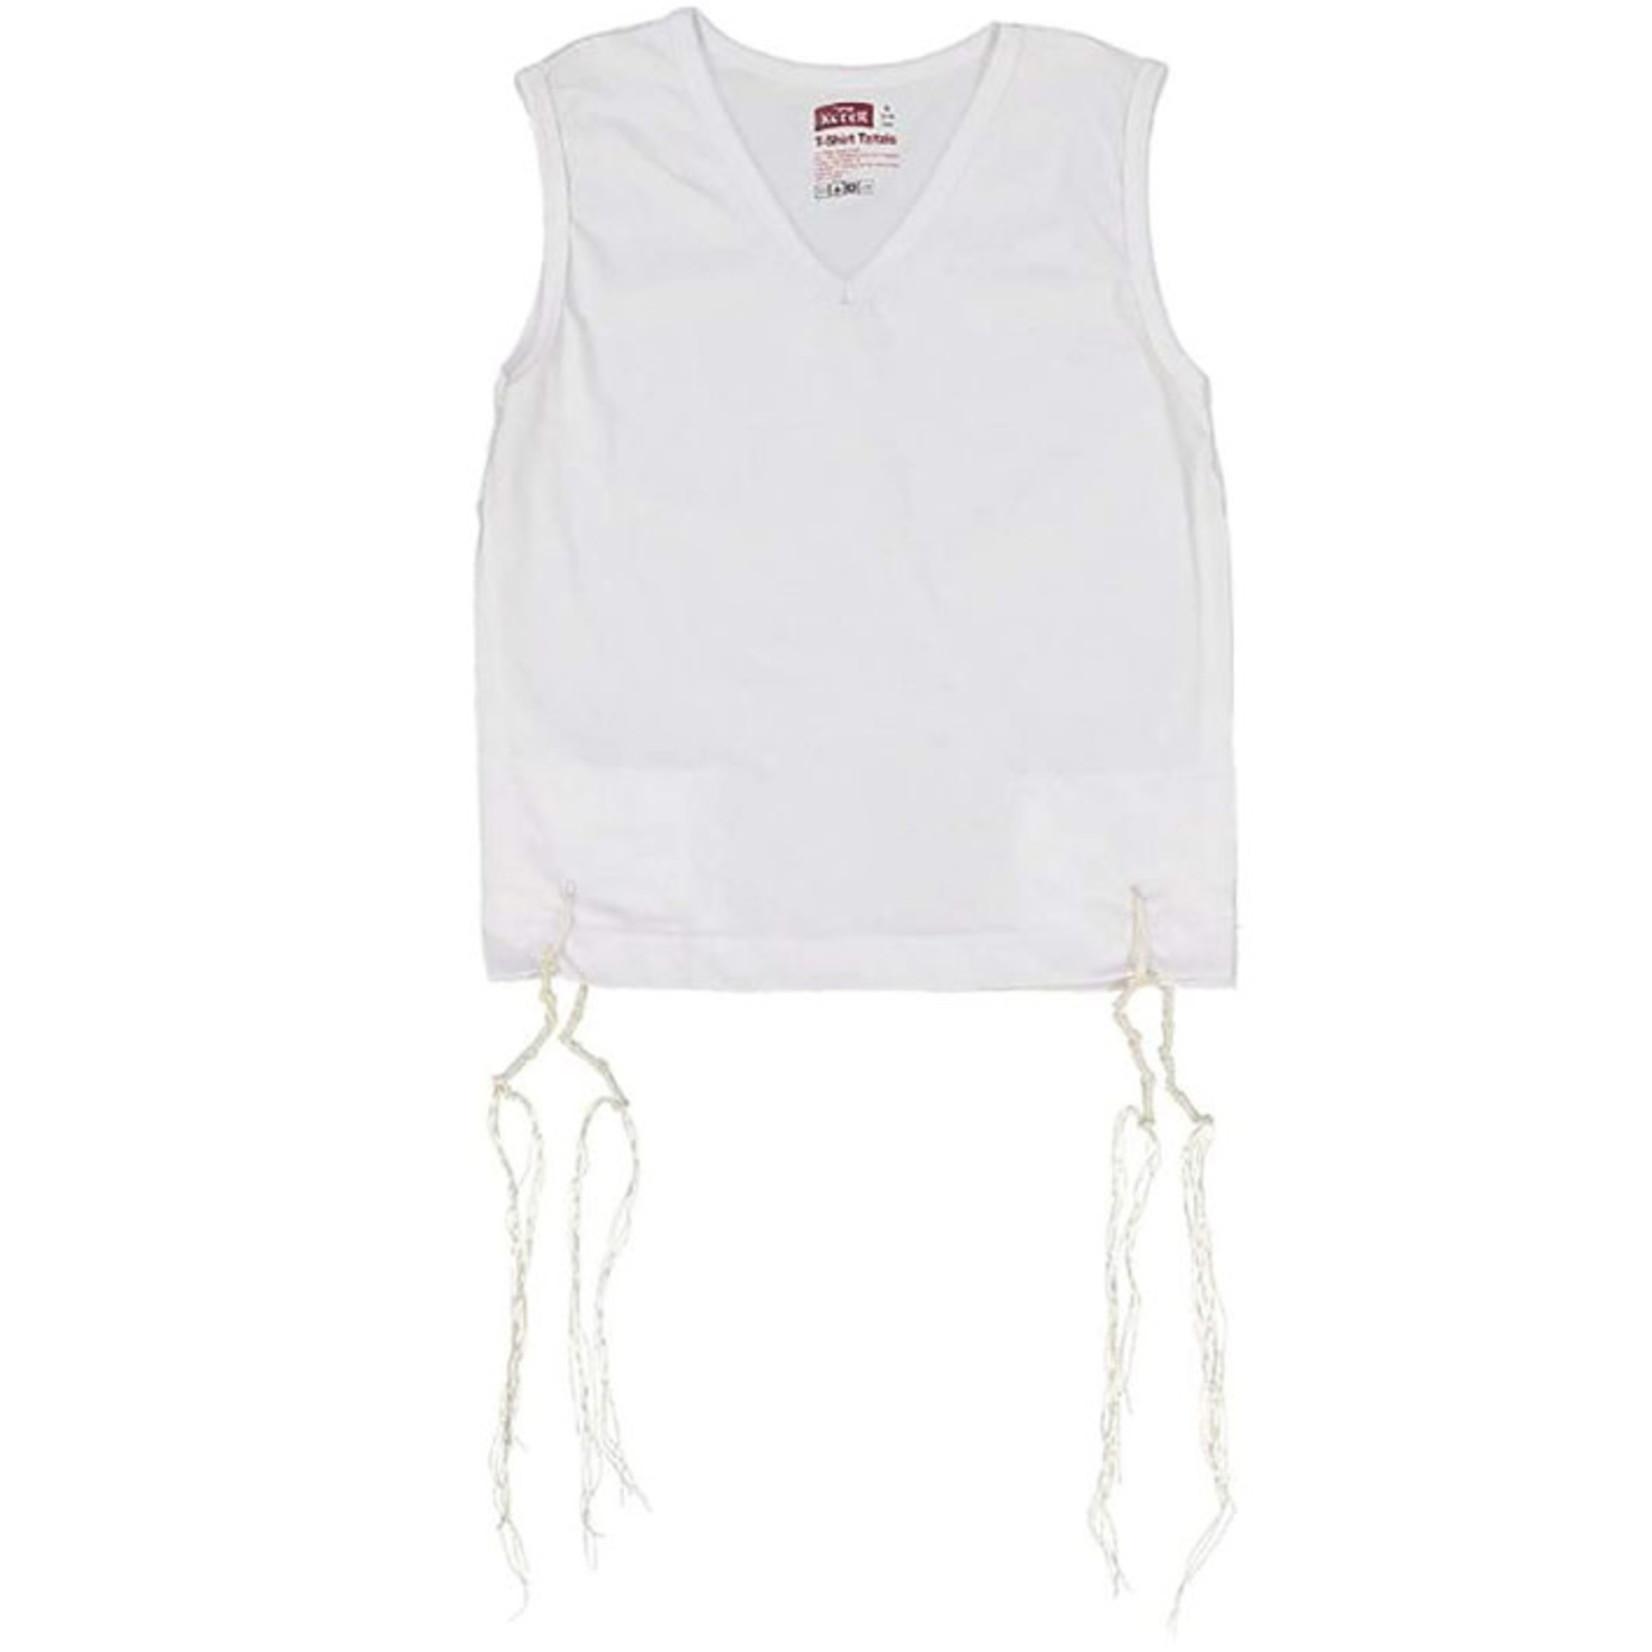 Undershirt-Style Arbah Kanfot, 100% Cotton, V-Neck, Size 4